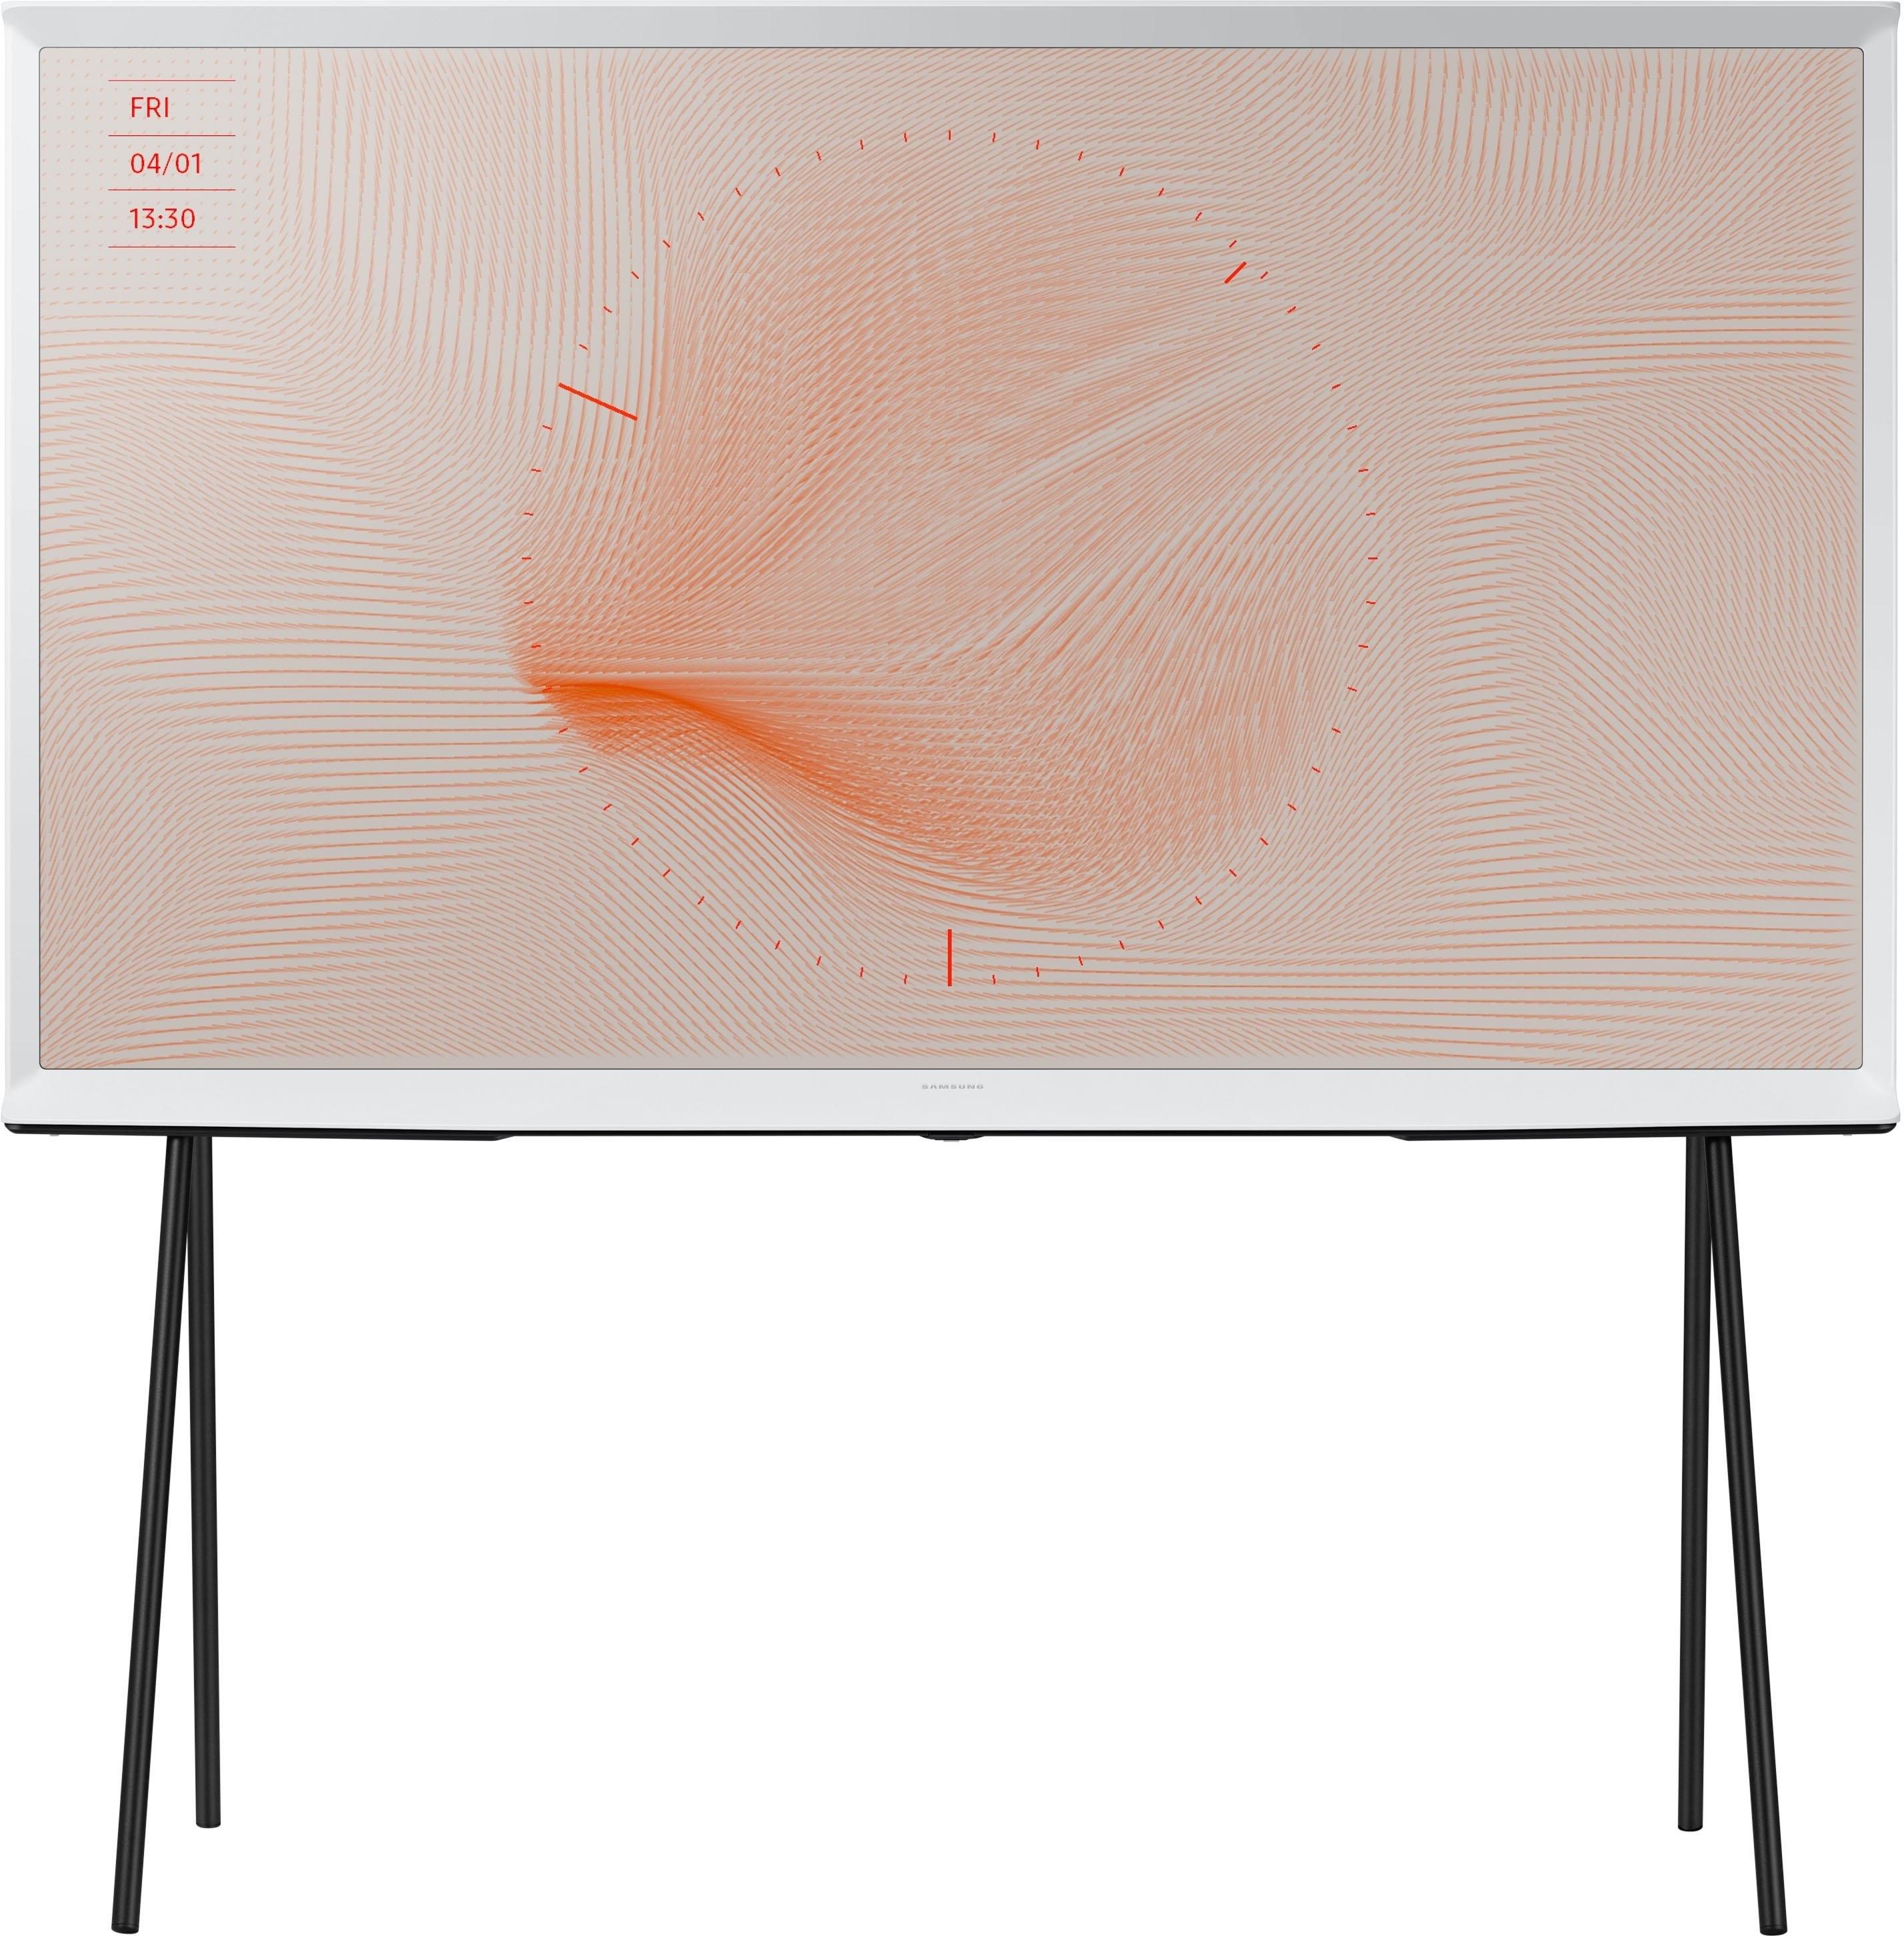 SAMSUNG Serif-TV QE43LS01RA QLED-tv (108 cm / 43 inch), 4K Ultra HD, Smart-TV bij OTTO online kopen